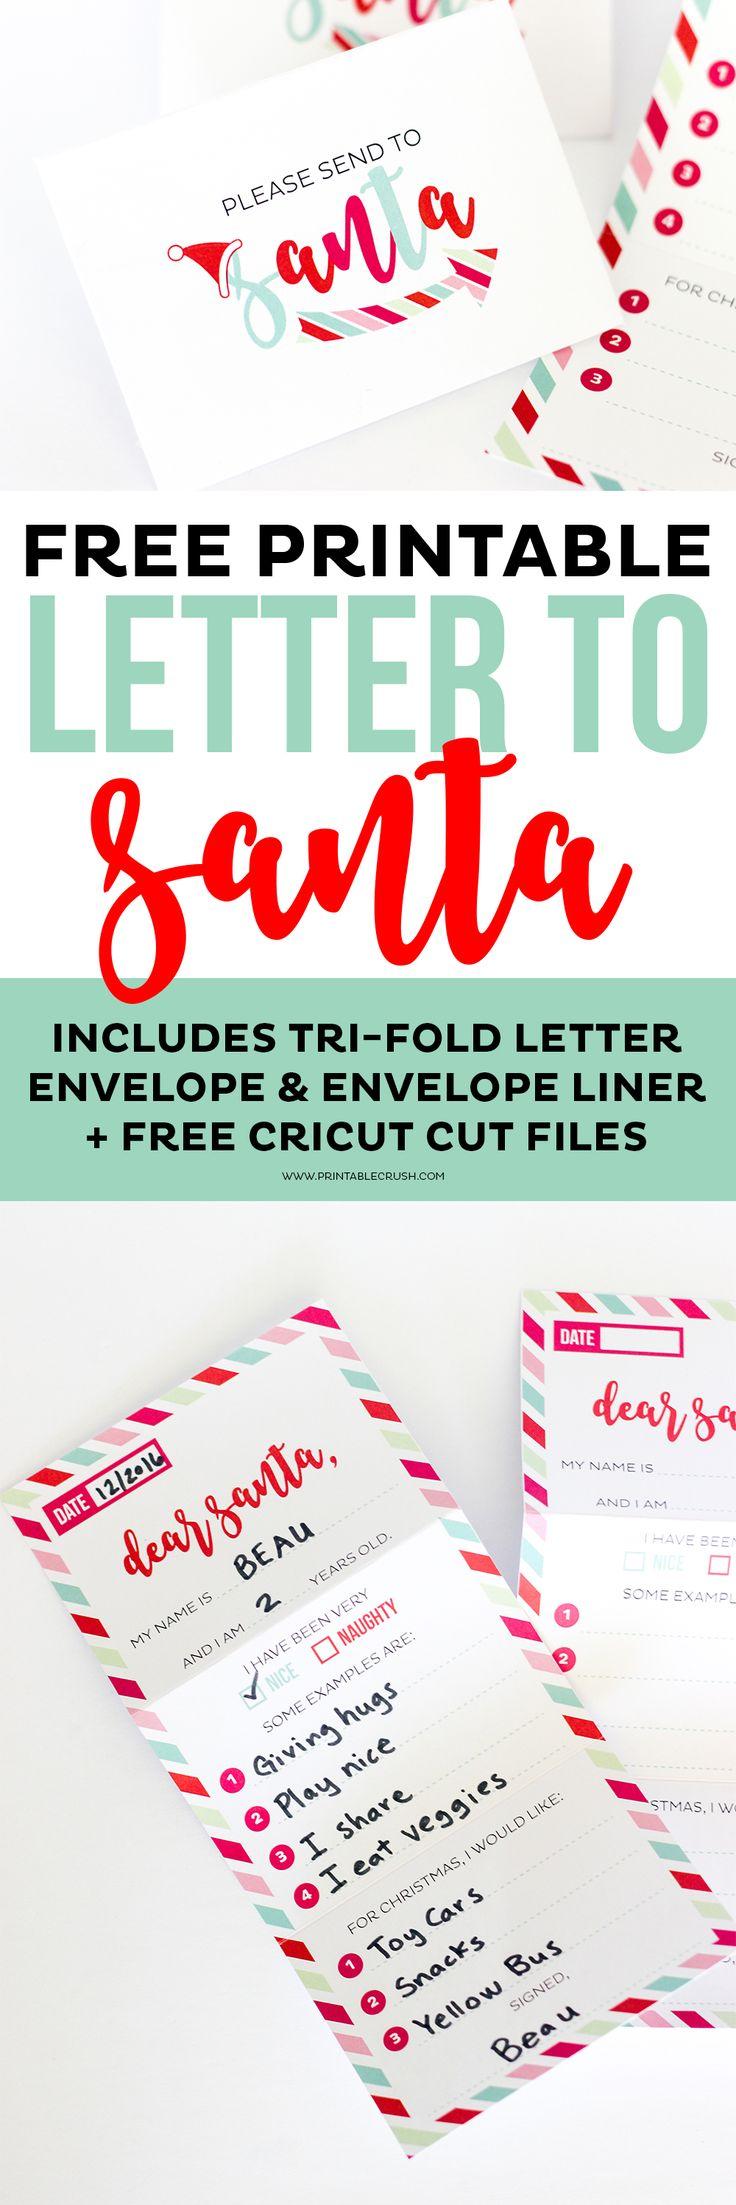 10 gorgeous christmas table decorating ideas 187 photo 2 - This Adorable Free Santa Letter Printable Set Includes A Tri Fold Letter Envelope